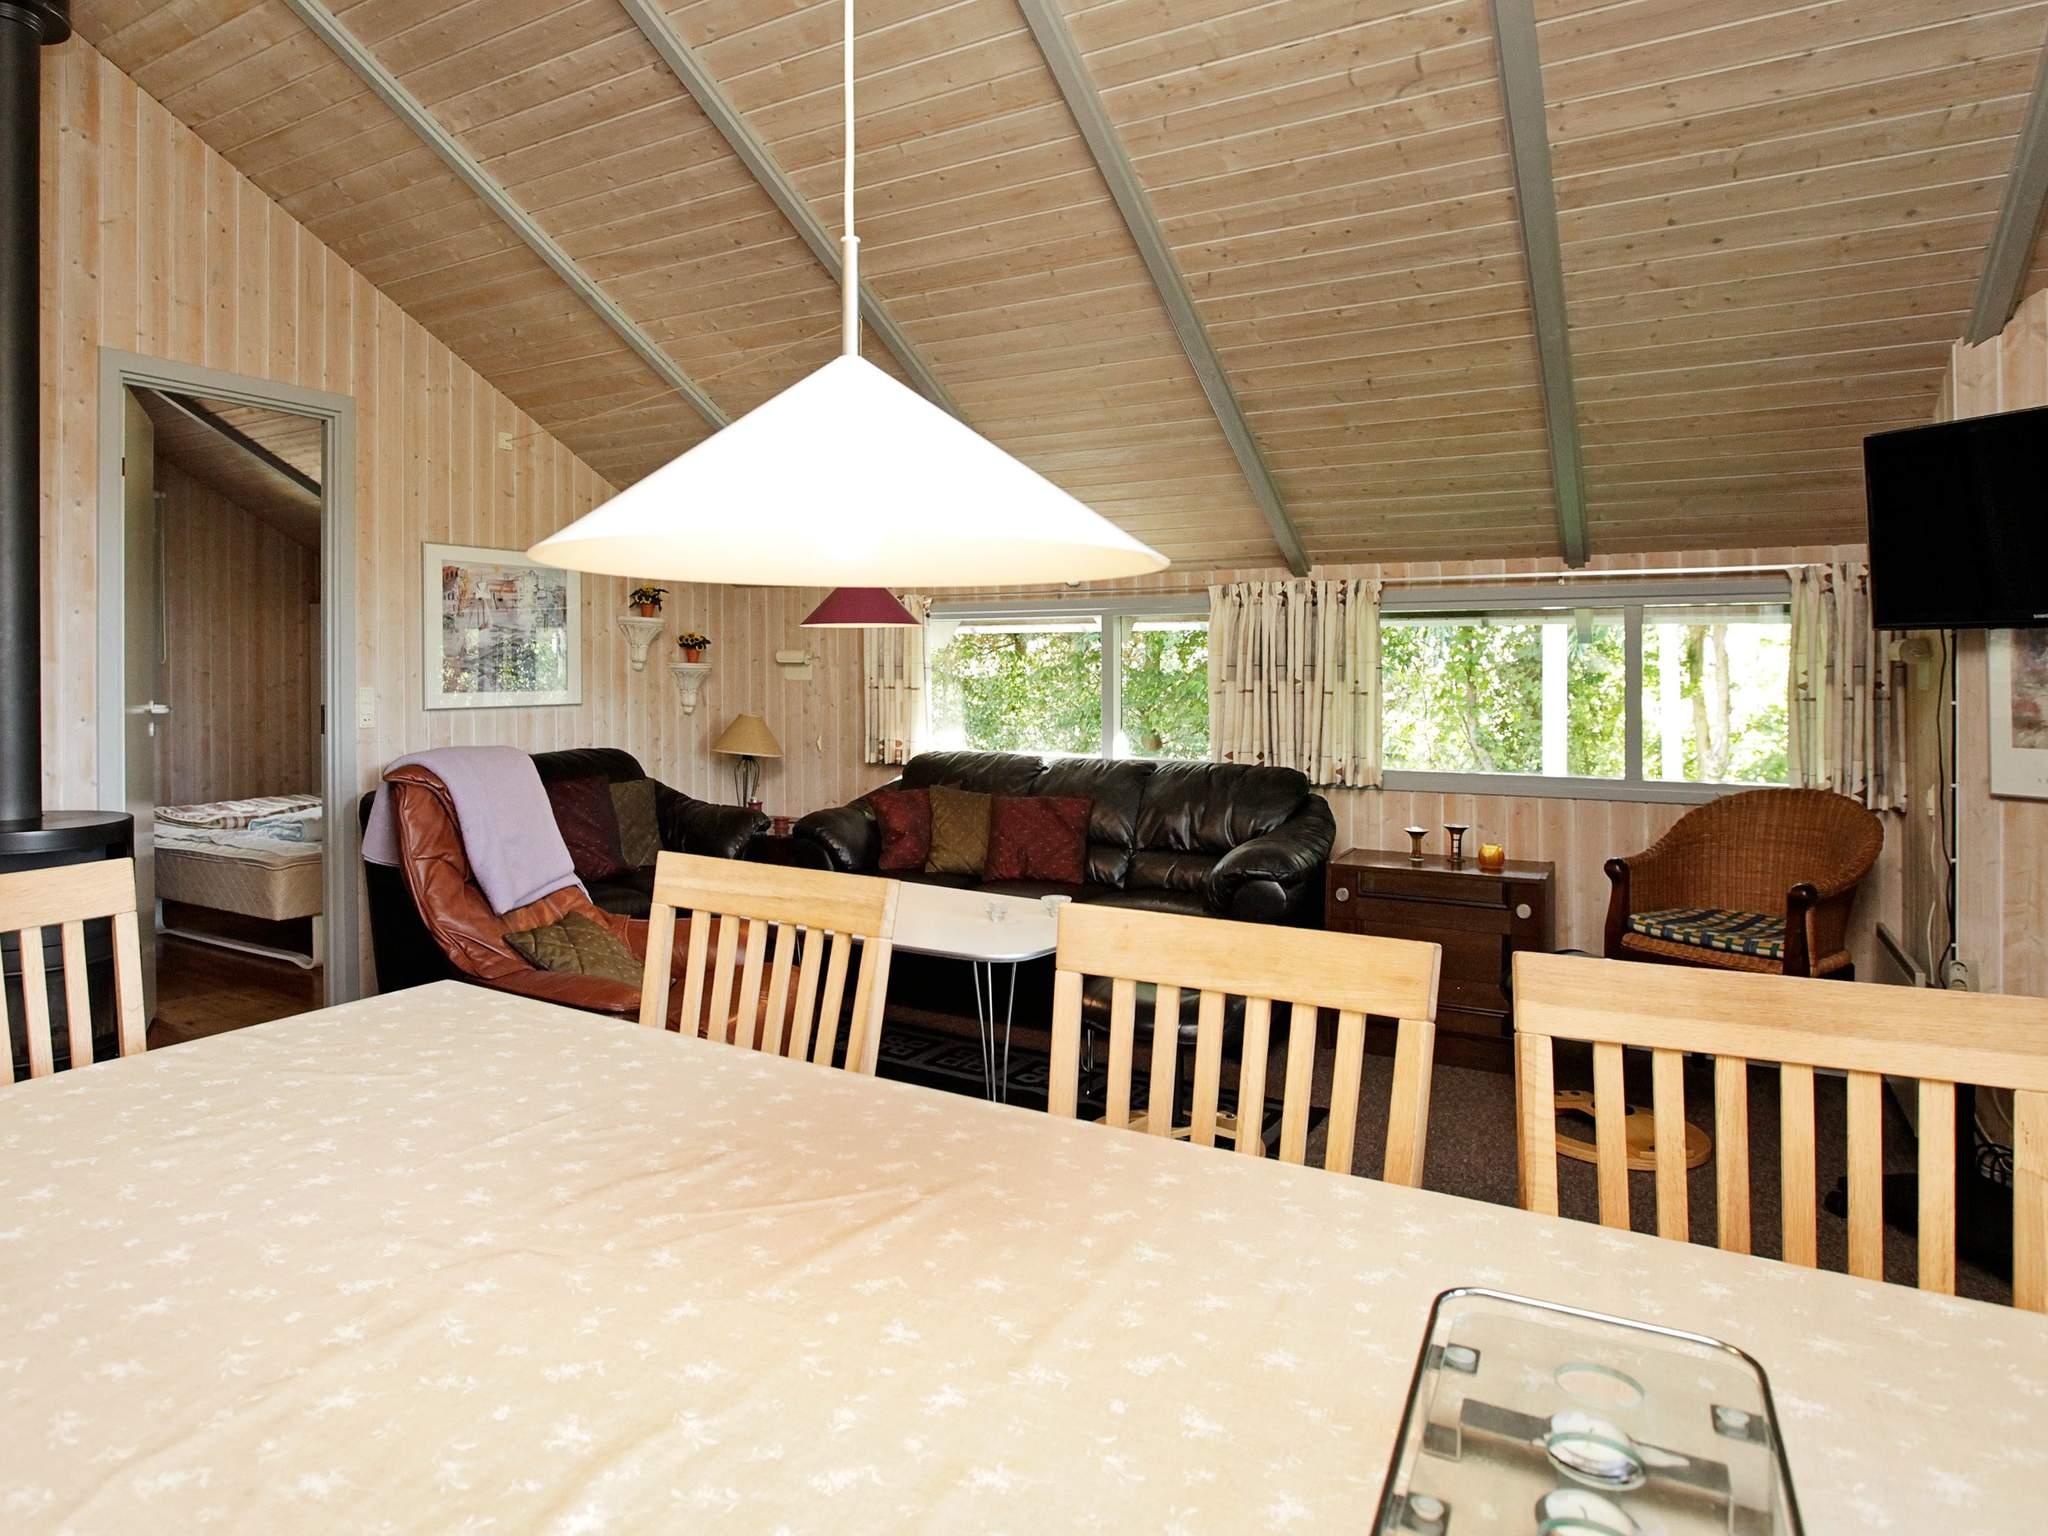 Ferienhaus Ristinge (93203), Ristinge, , Langeland, Dänemark, Bild 11